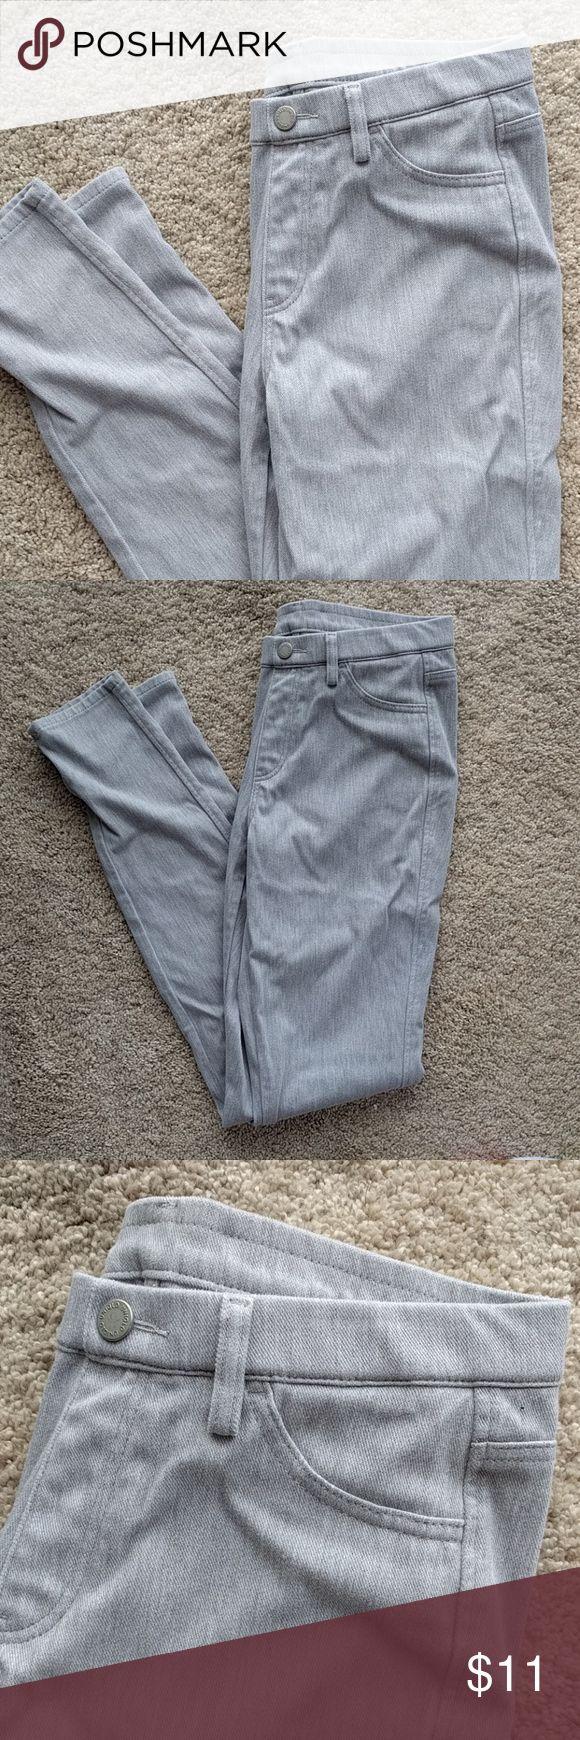 Uniqlo leggings Uniqlo grey/gray leggings.  Worn twice, one wash. Waist 26-27 inches Uniqlo Pants Leggings